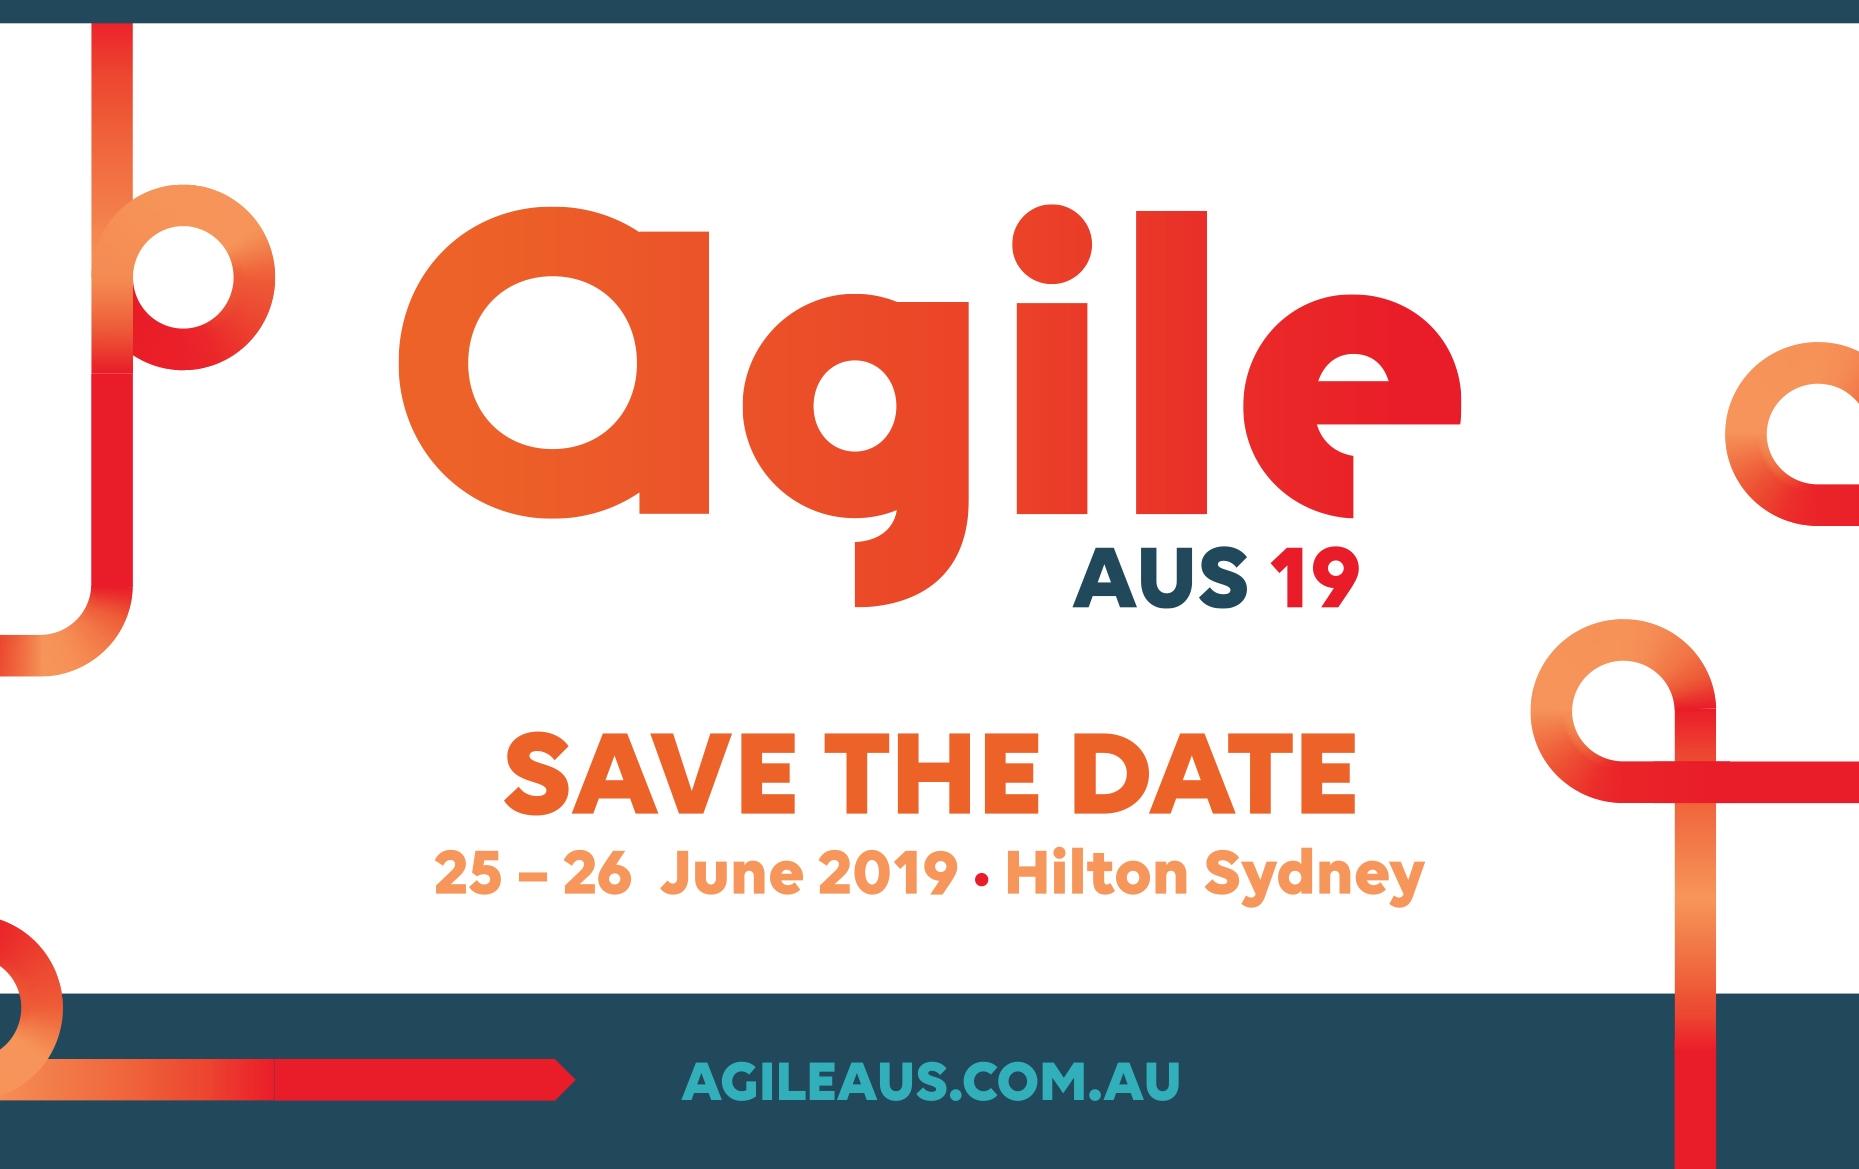 AgileAus 19 (Agile Australia 2019) - logo